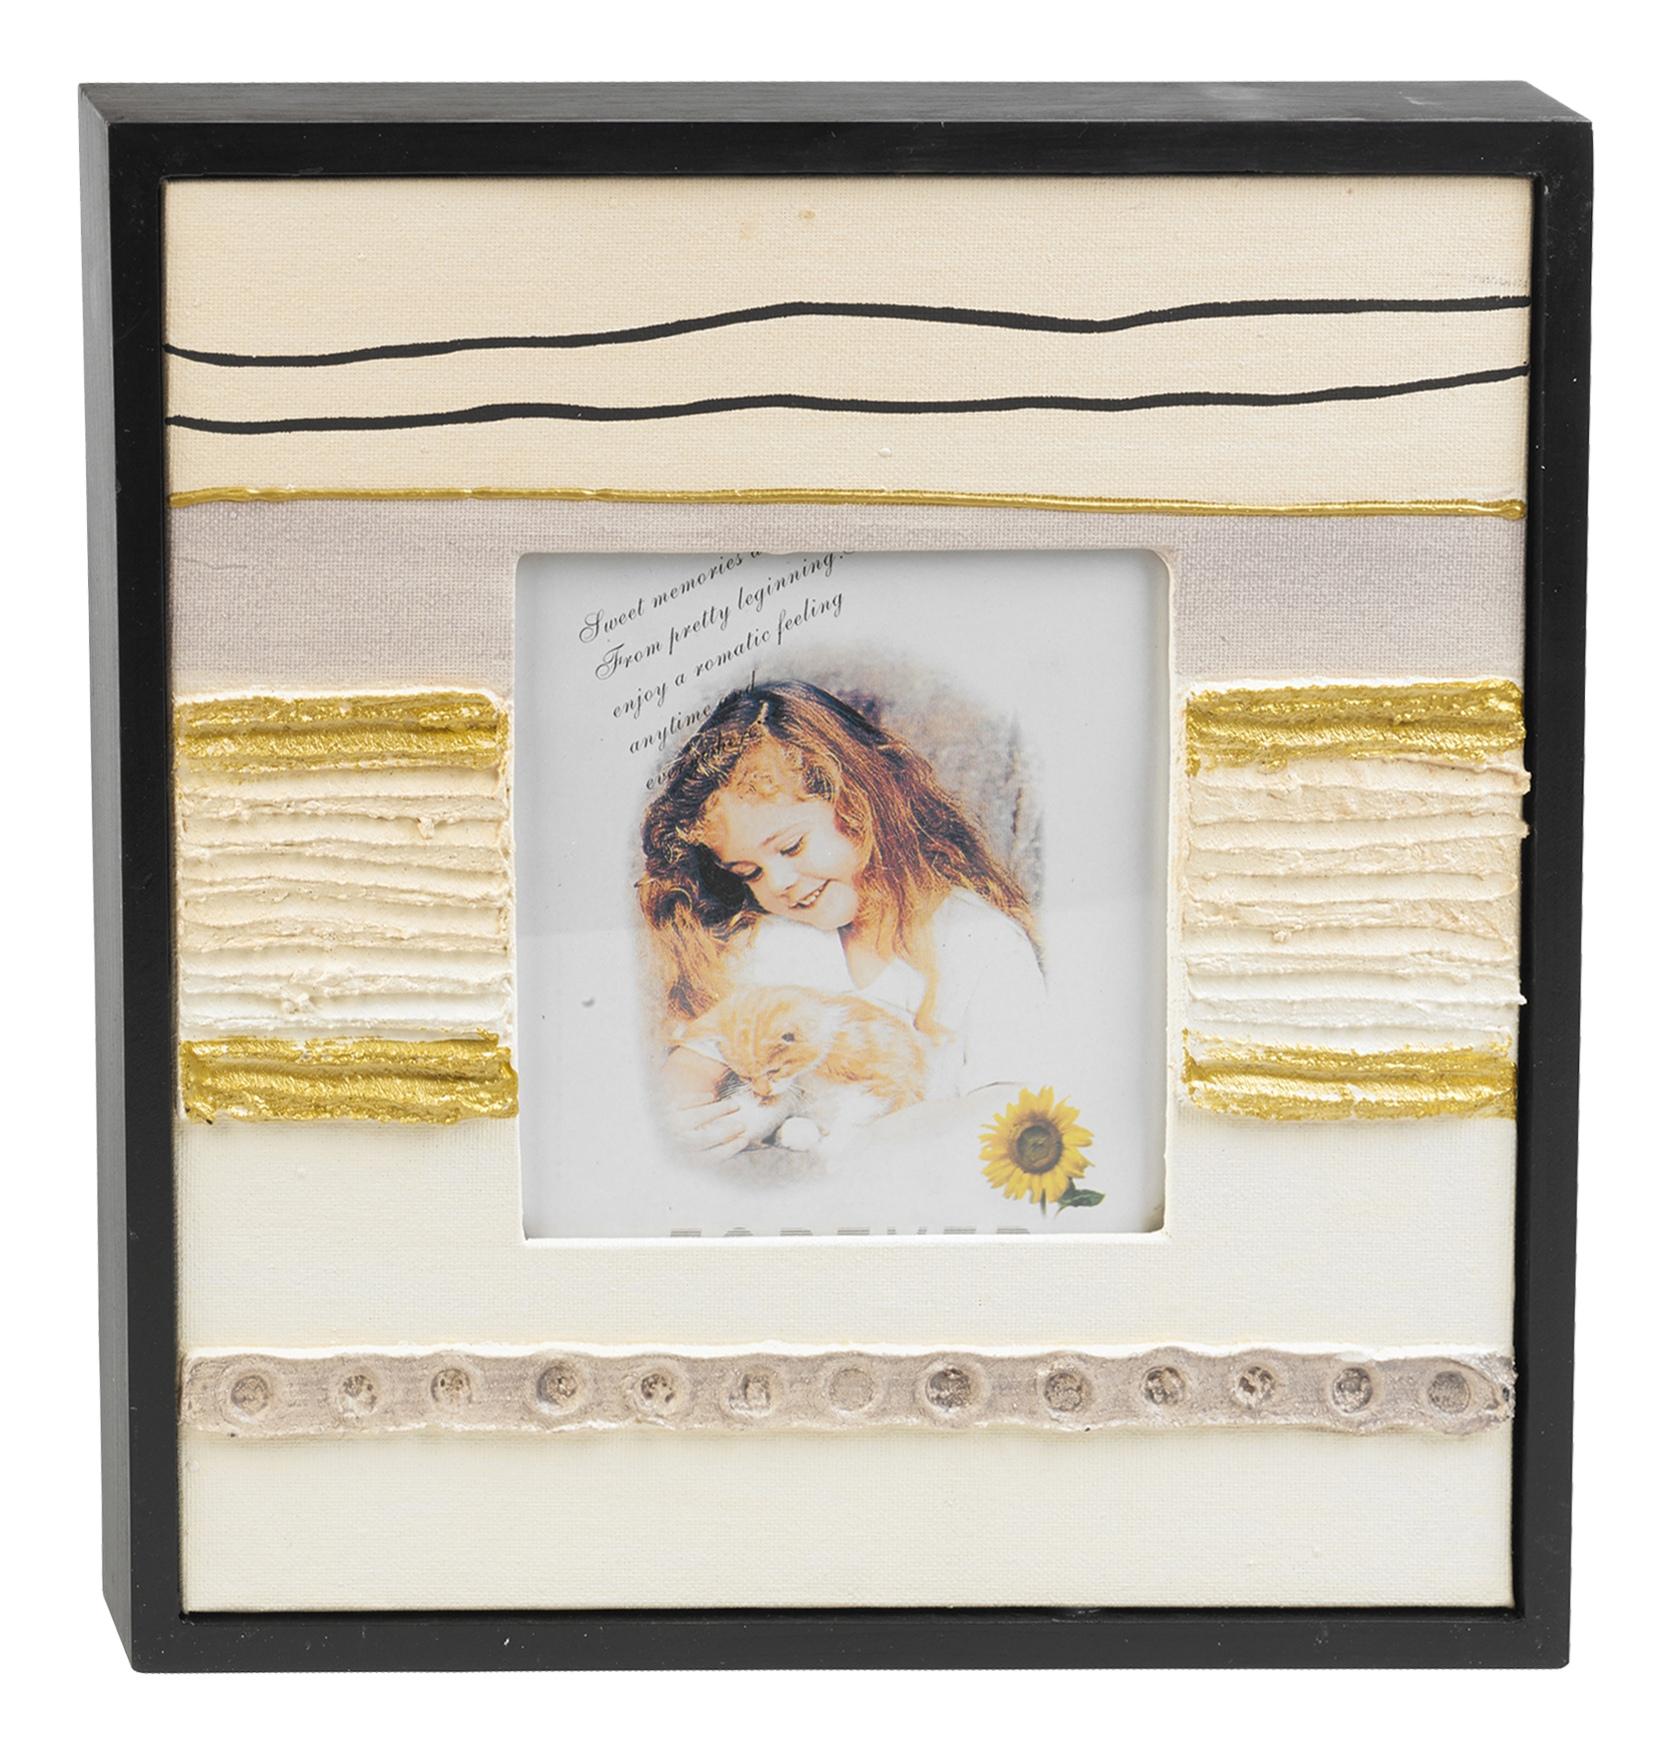 decorative canvas photo picture frame art kids bedroom nursery wall hanging ebay. Black Bedroom Furniture Sets. Home Design Ideas